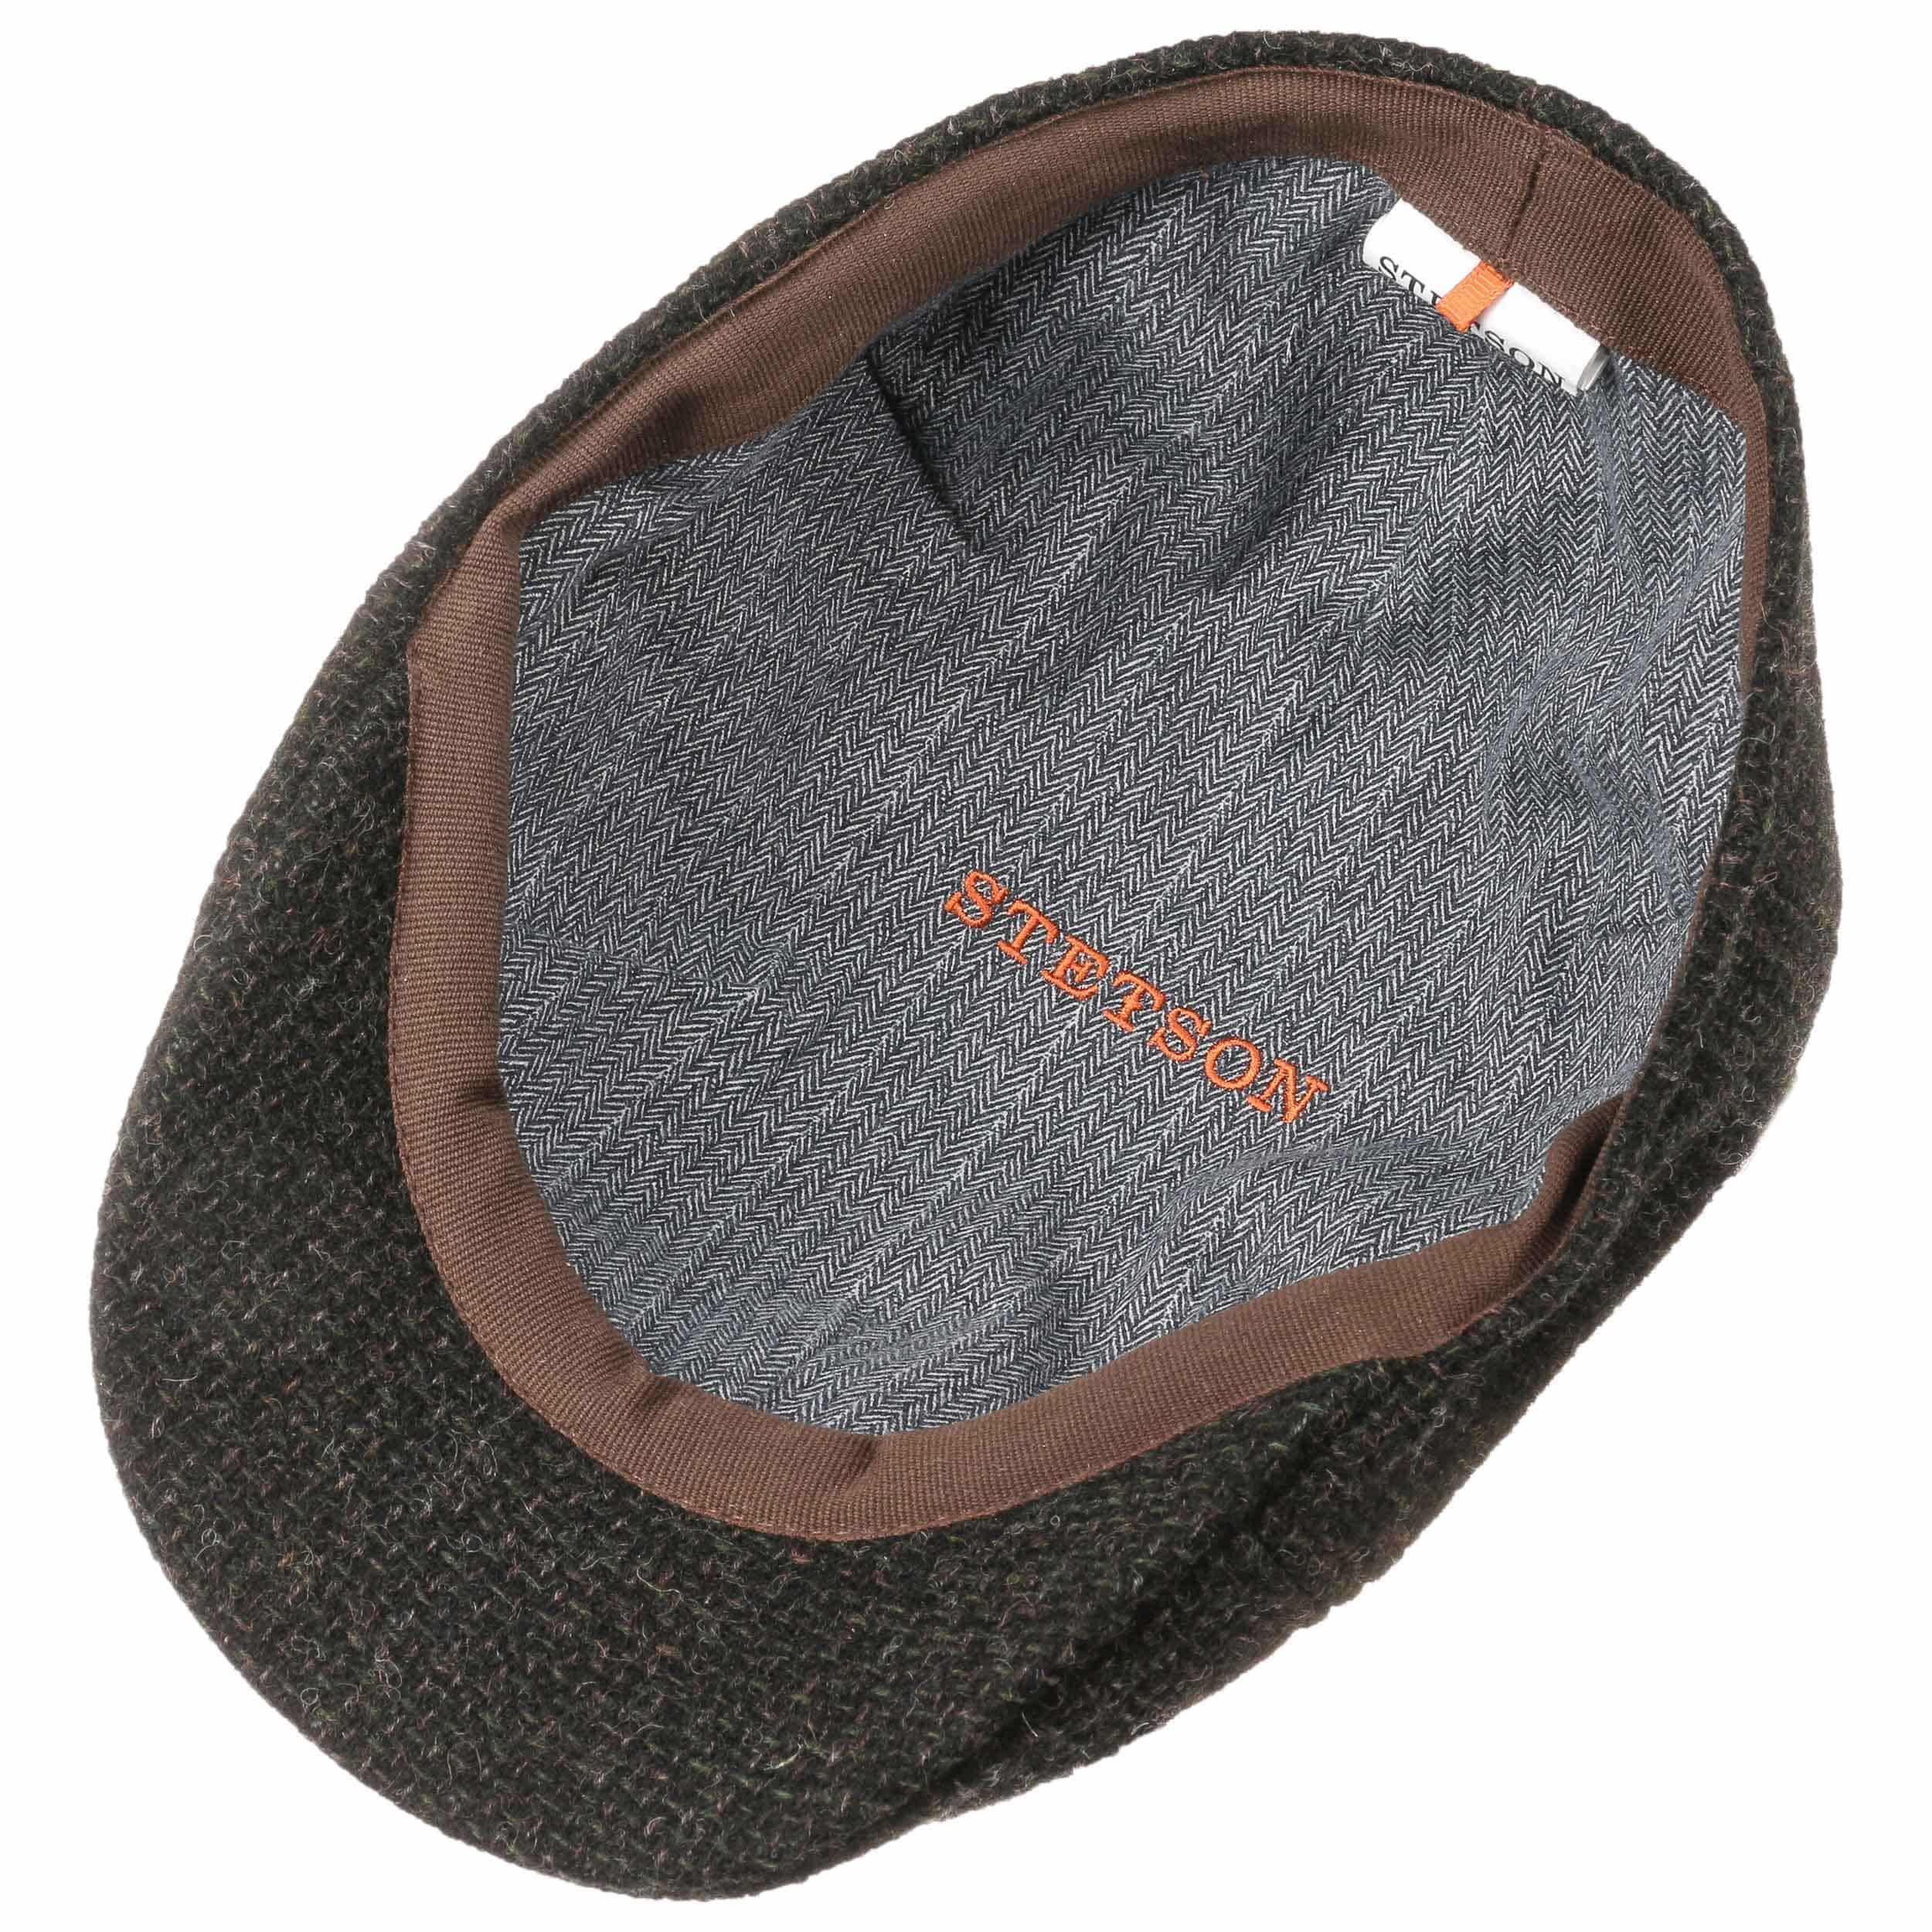 ... Coppola Texas Classic Wool by Stetson - nero 2 ... 9ae231b52d51